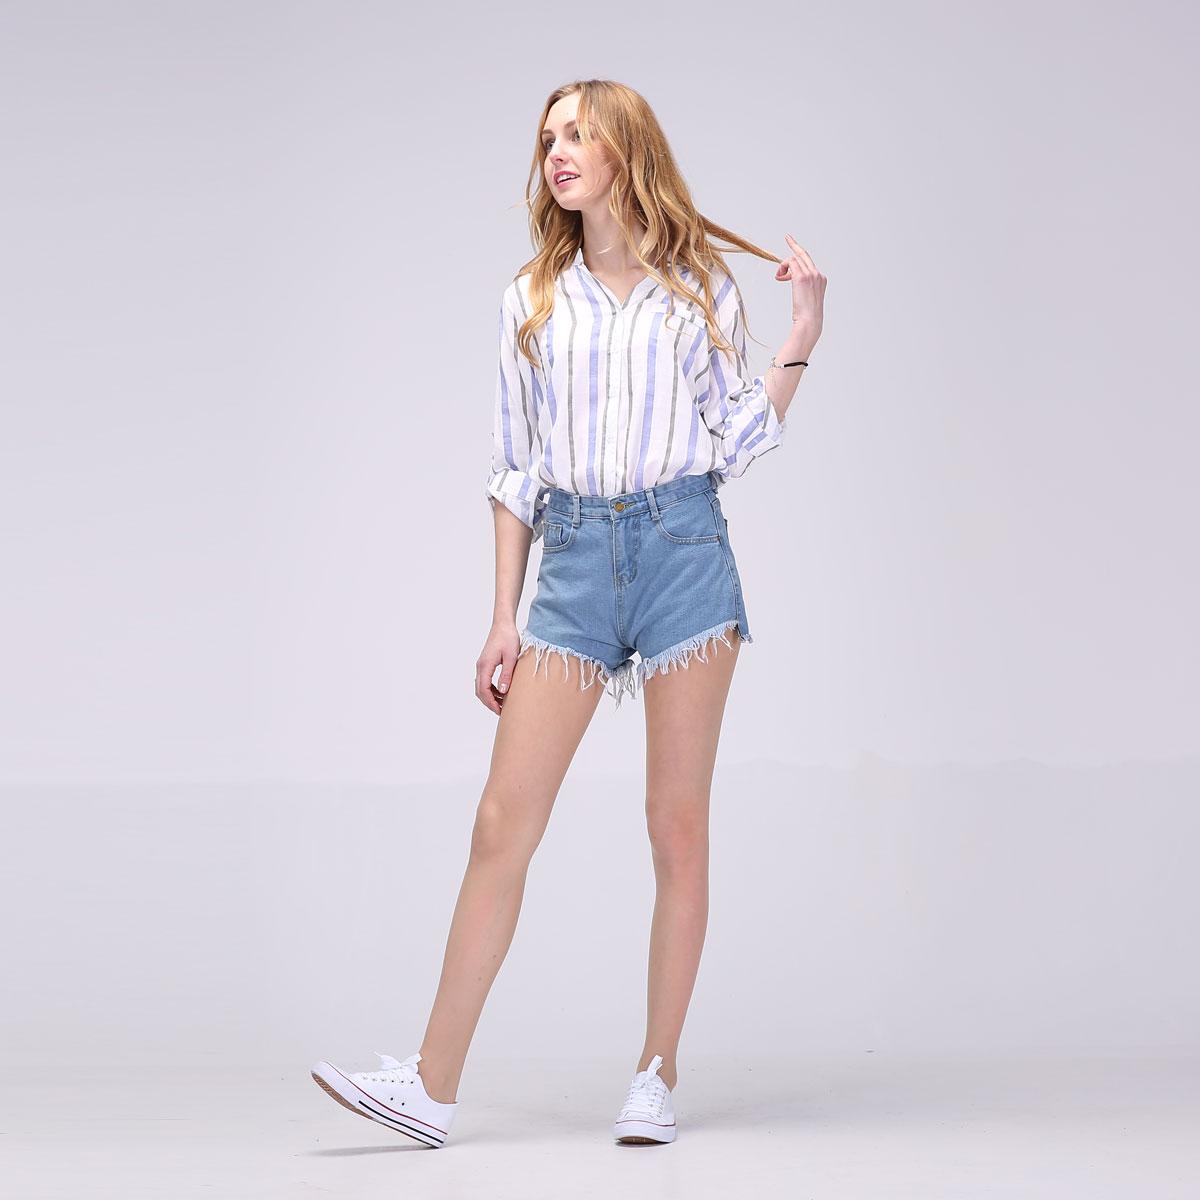 2017 Hot New Women Full Sleeve Blouses Striped Shirts Women Summer Tops Flare Sleeve Blouse Chemise Femme P Size 15